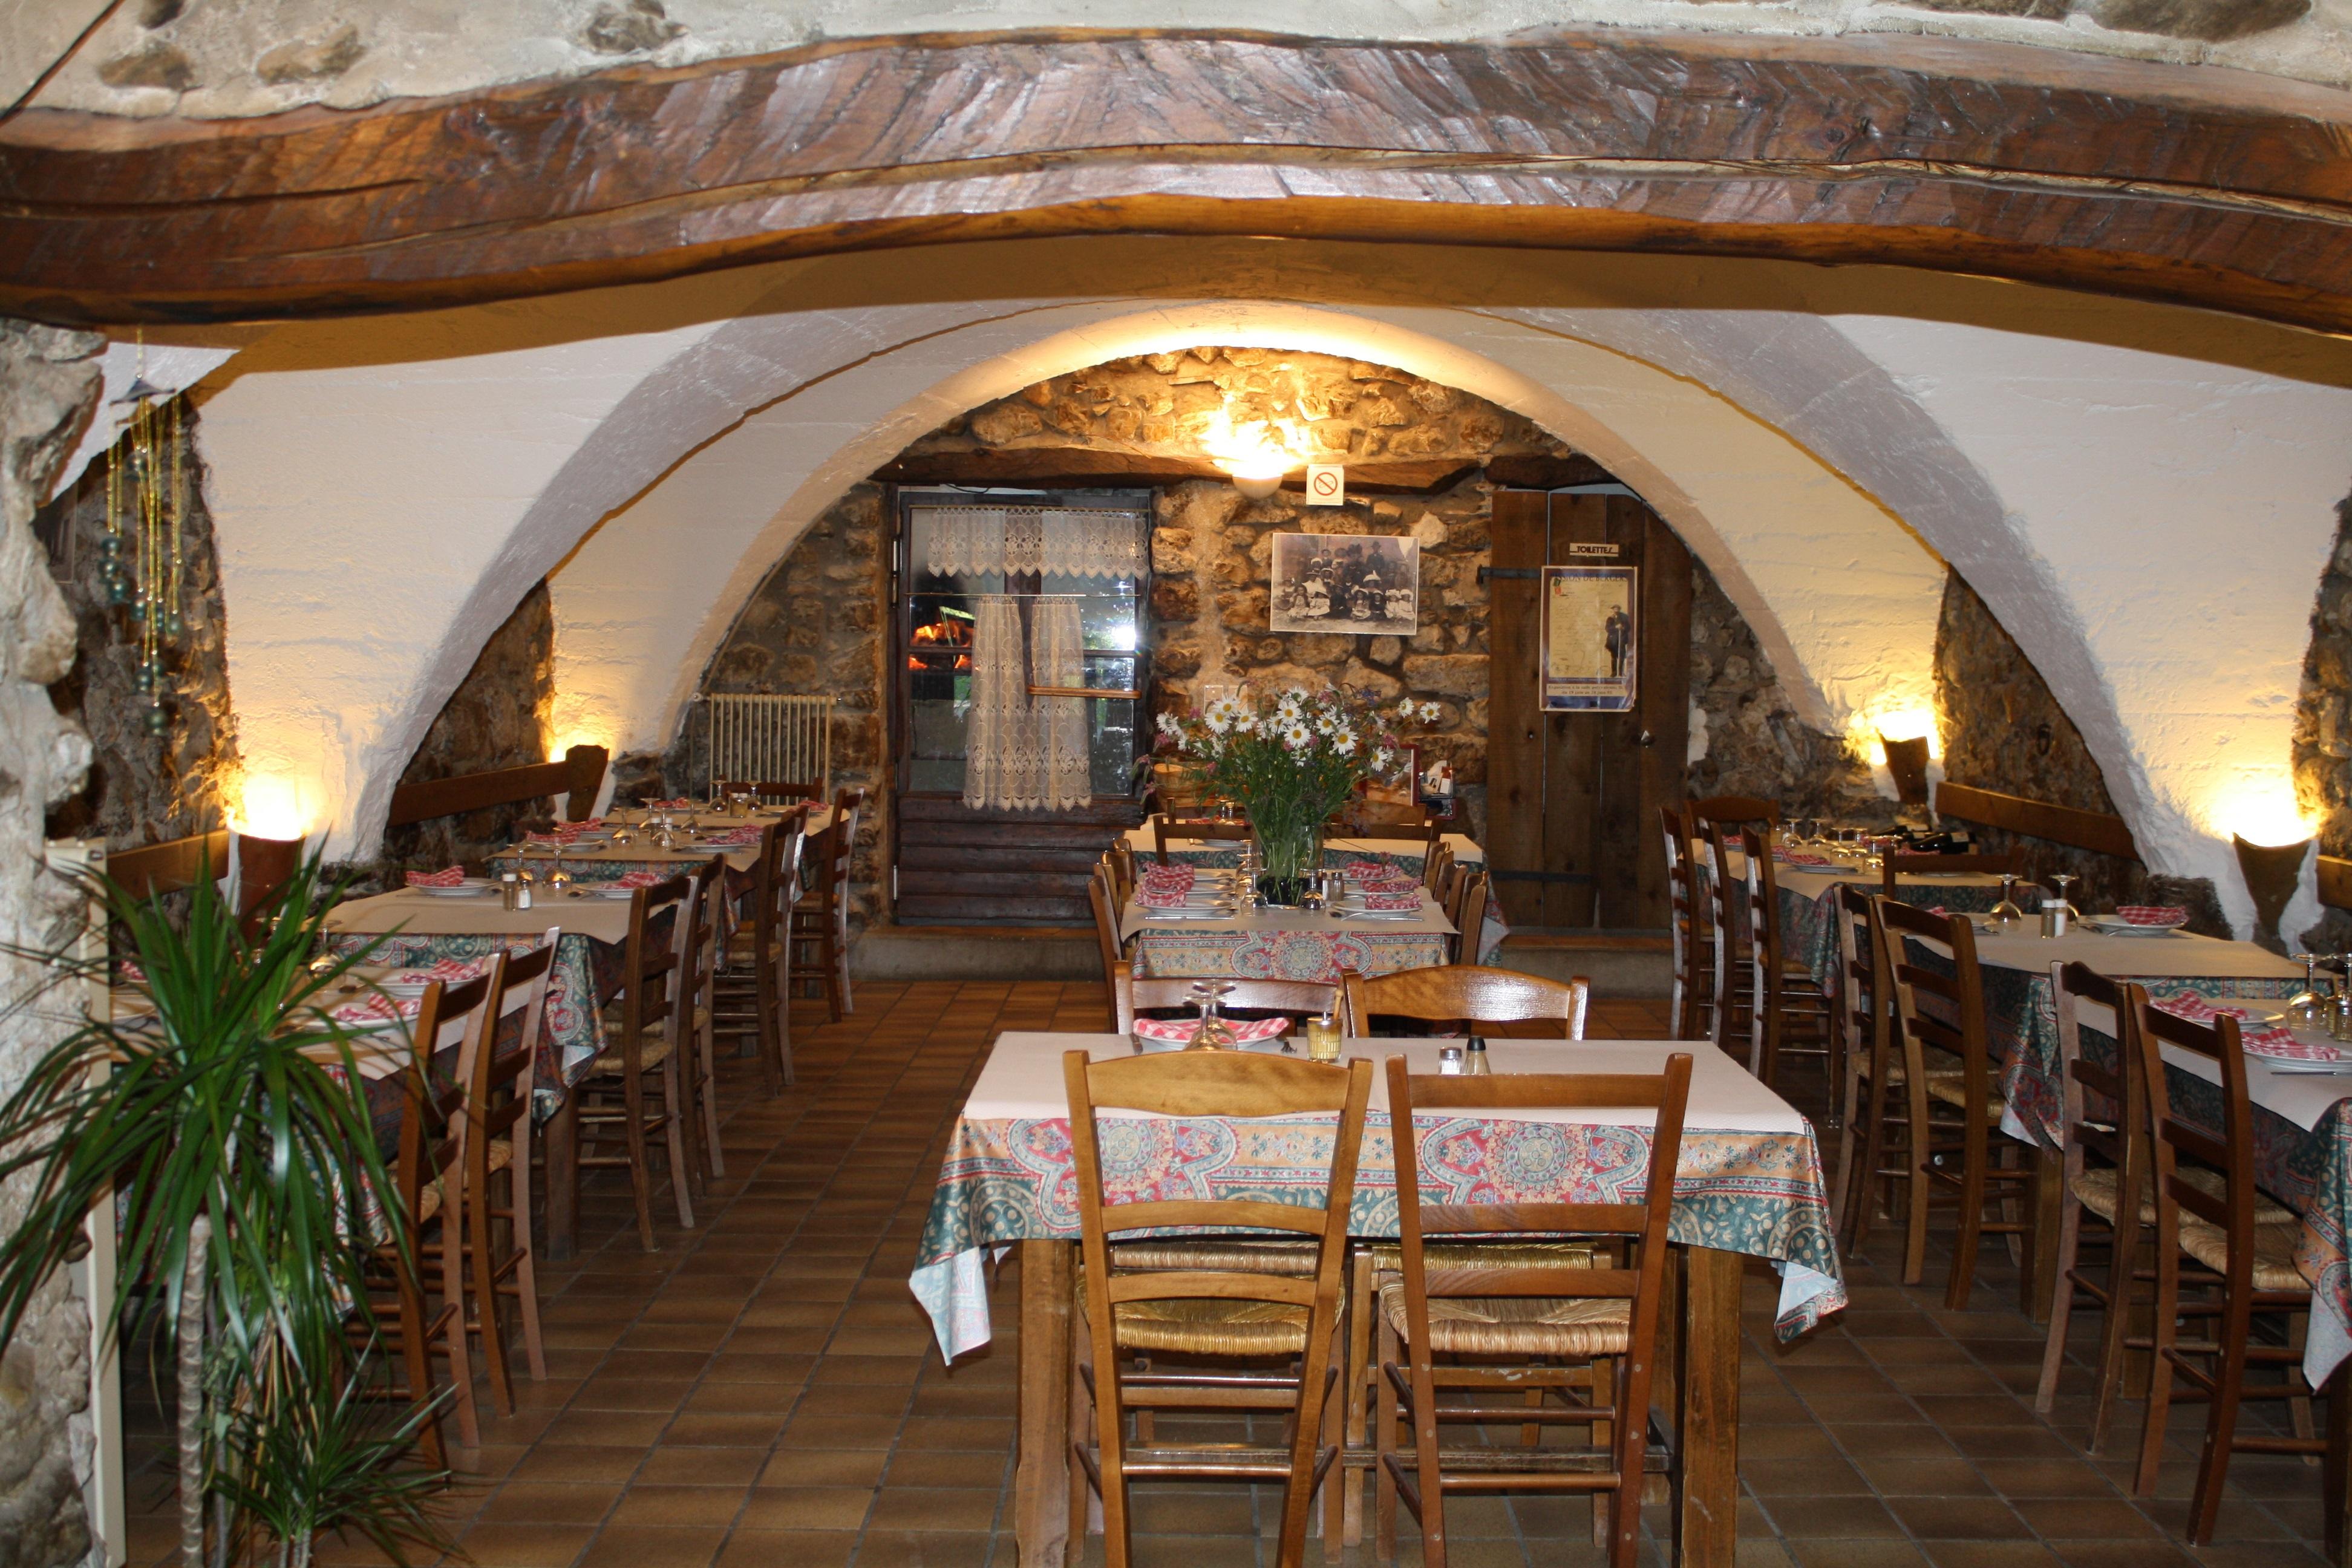 Vente Auberge dans la Drôme à la campagne (26)